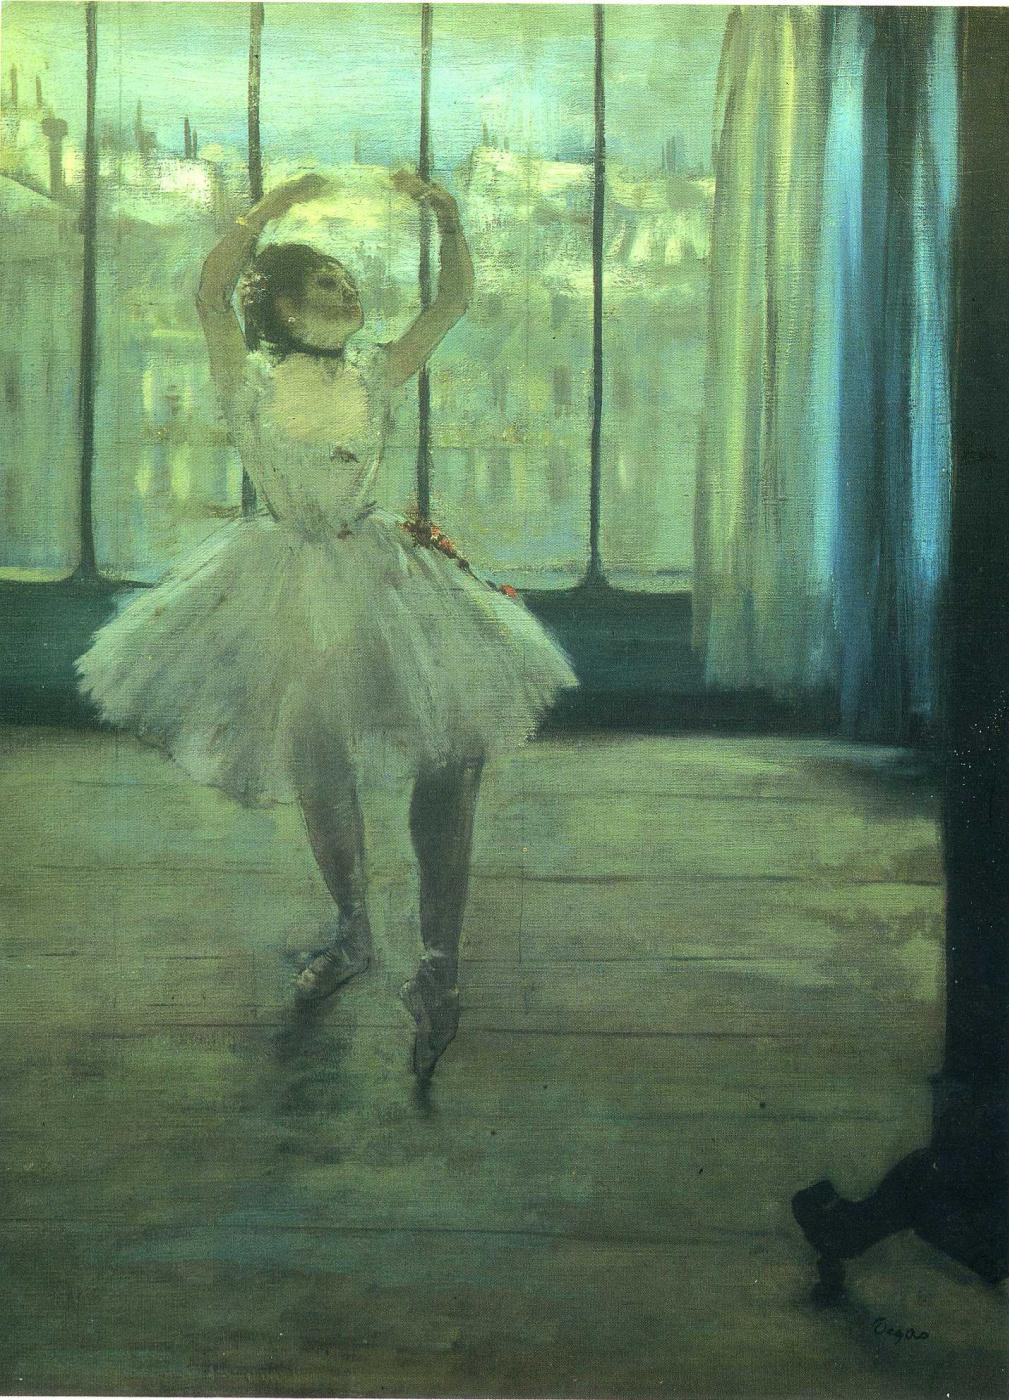 Edgar Degas. Dancer at the Photographer's Studio